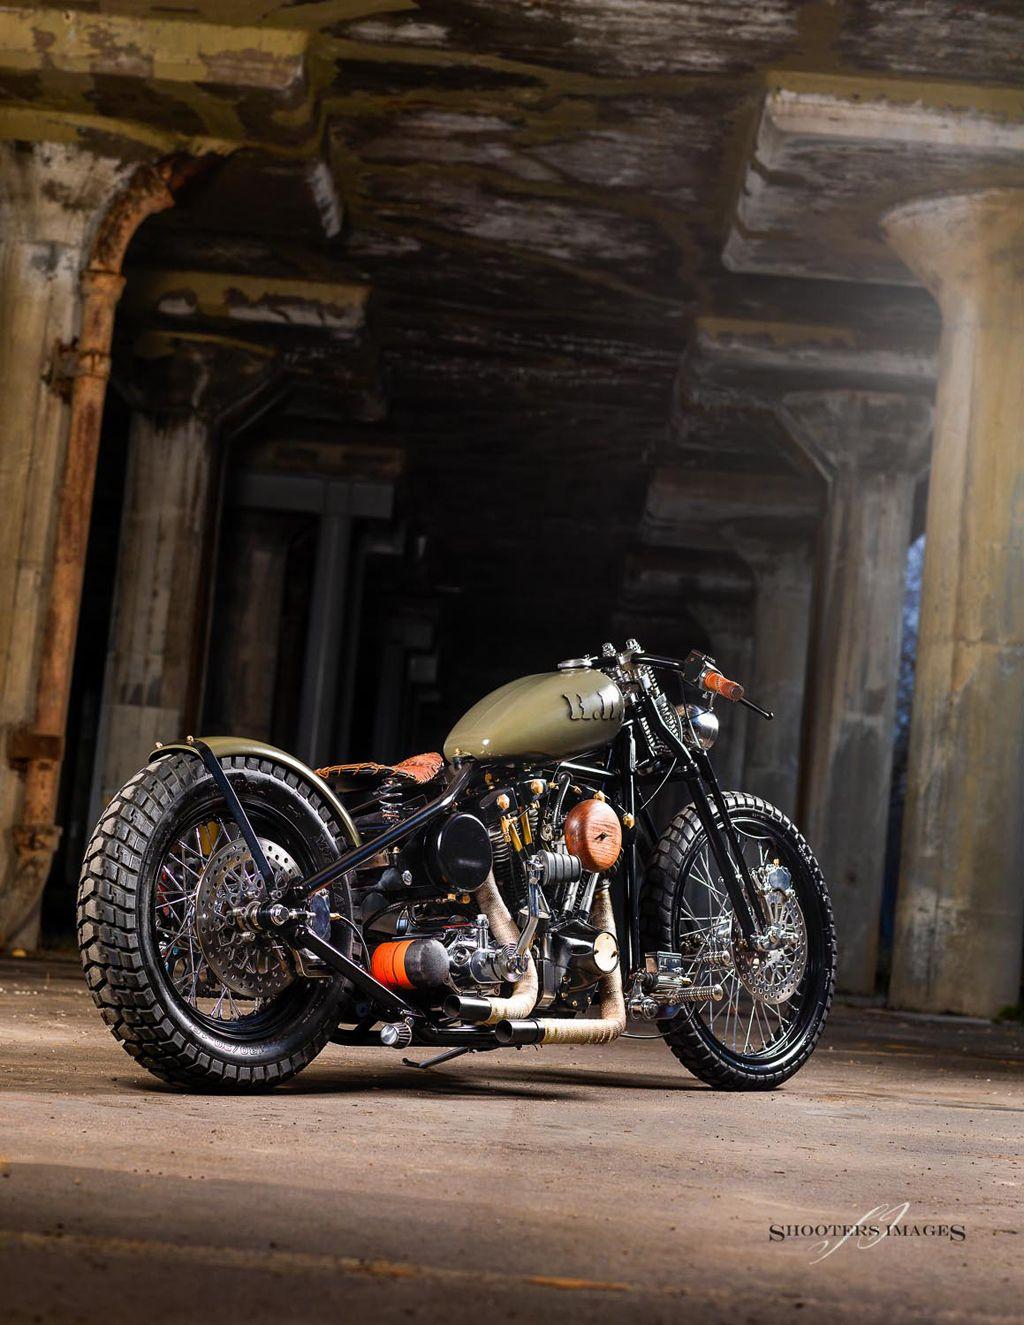 http://cgi.ebay.com/ebaymotors/Harley-Davidson-Other-Custom-harley-shovelhead-bobber-chopper-FL-/300833522597?pt=US_motorcycles=item460b1343a5#